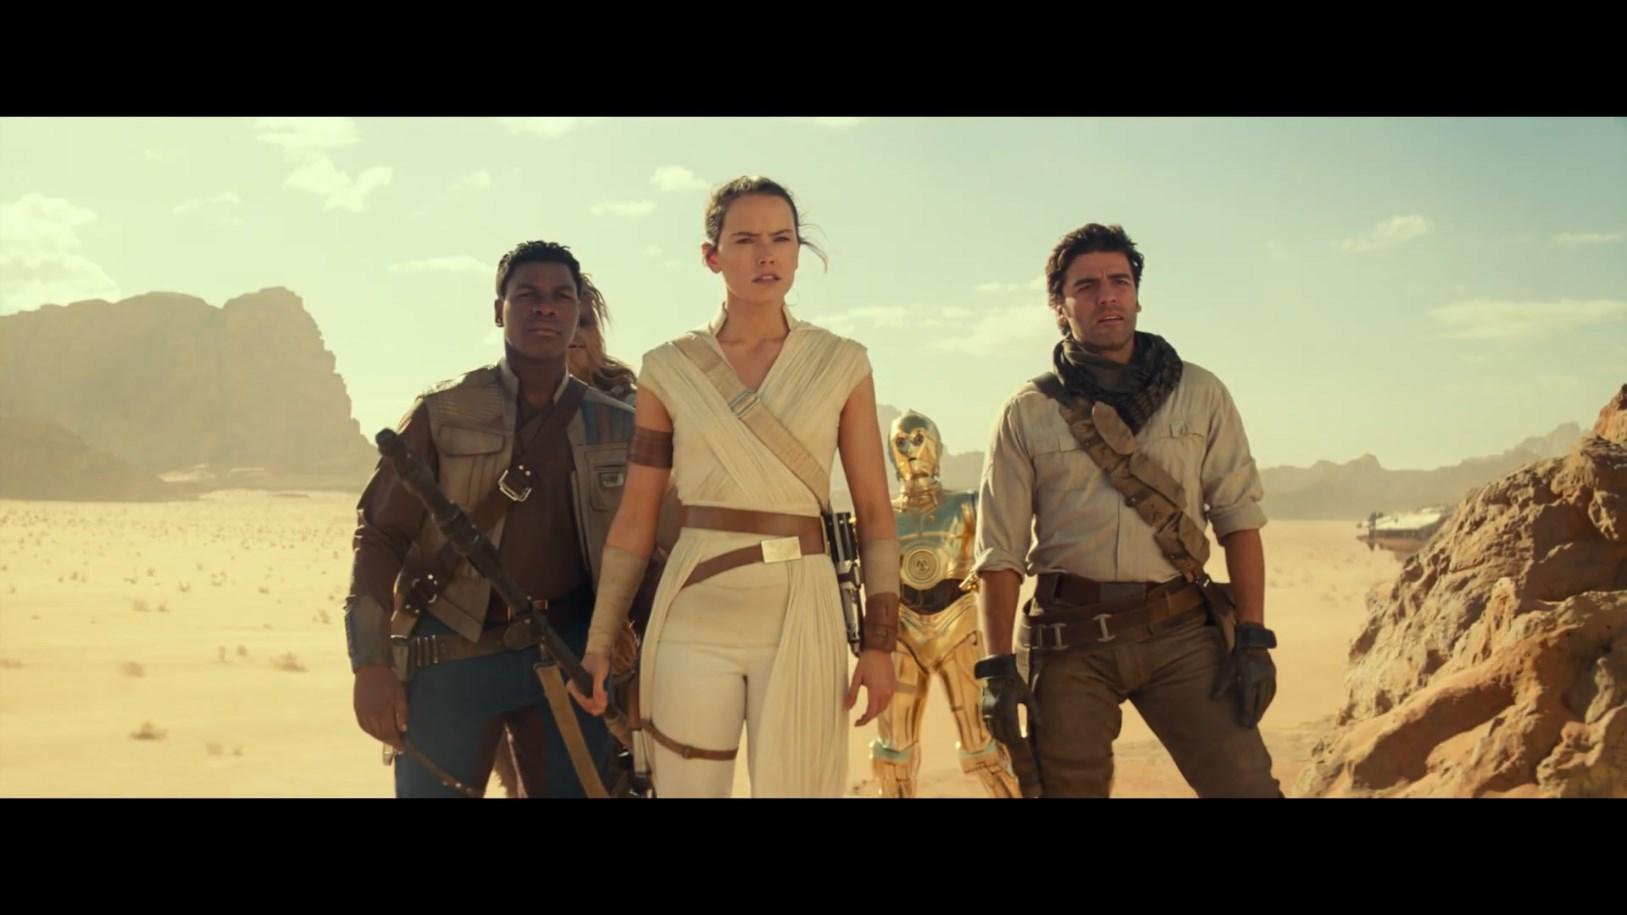 star_wars_the_rise_of_skywalker_d23_special_look_mp4_snapshot_01_14_485.jpg